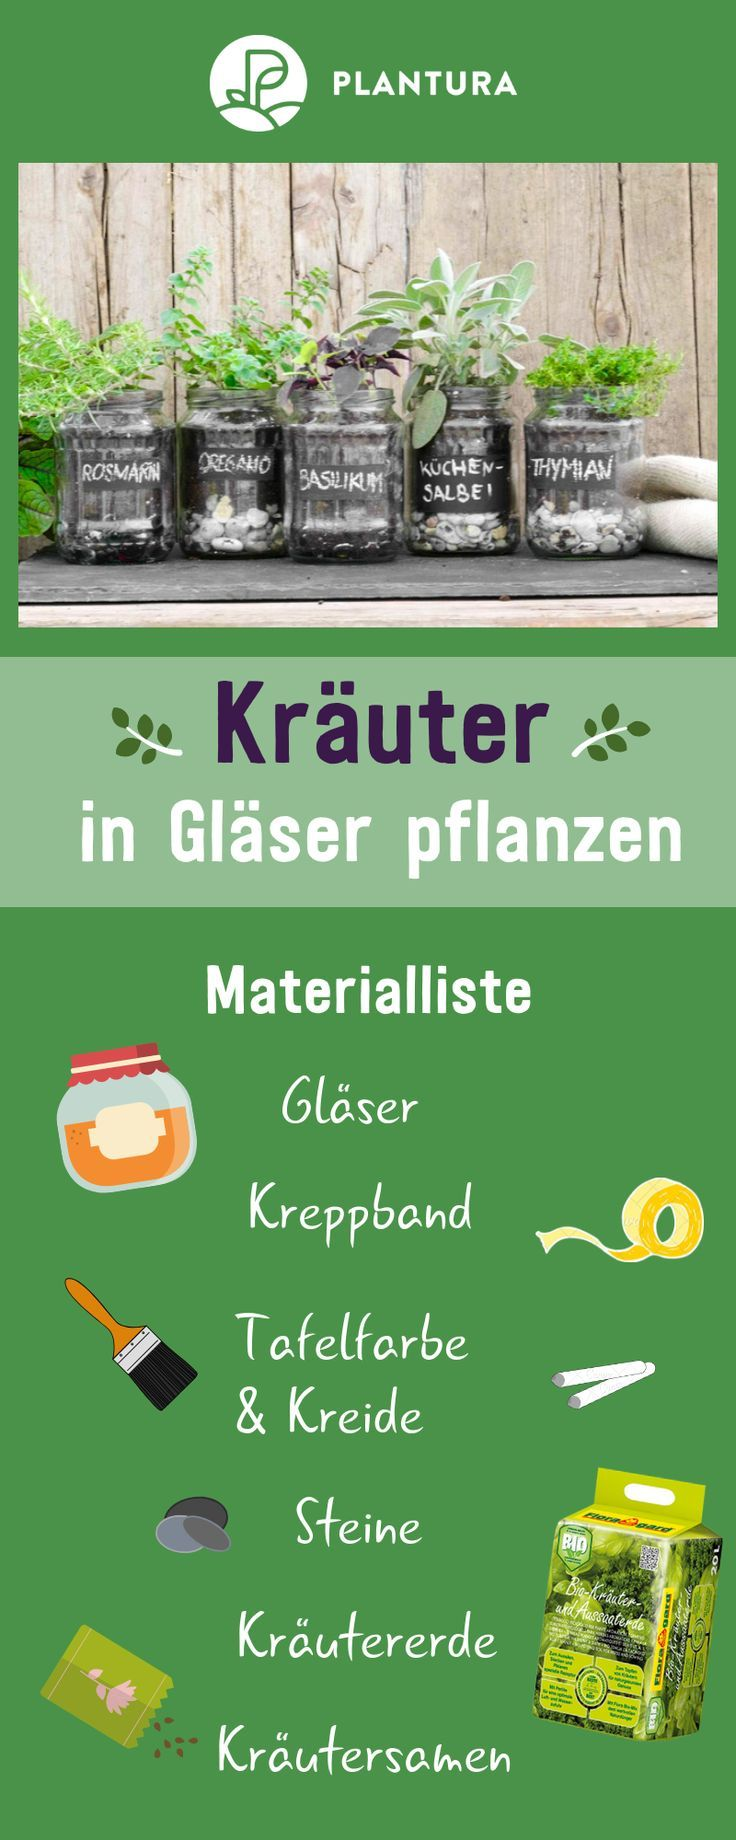 Kräuter im Glas pflanzen: Video-Anleitung & Tipps #herbsgarden